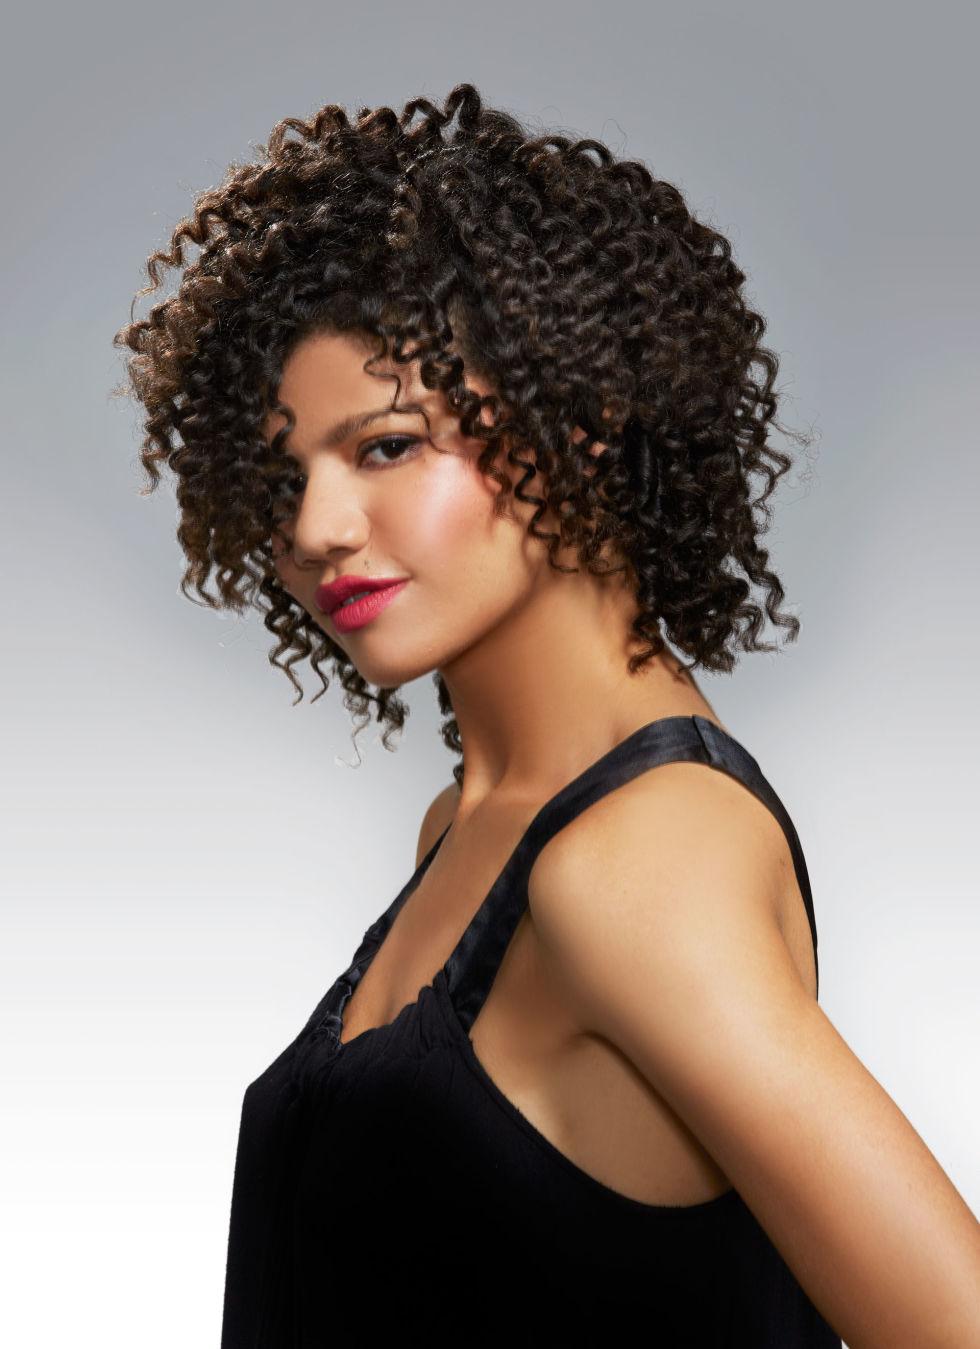 Brilliant 29 Black Hairstyles Best African American Hairstyles Amp Haircuts Short Hairstyles For Black Women Fulllsitofus